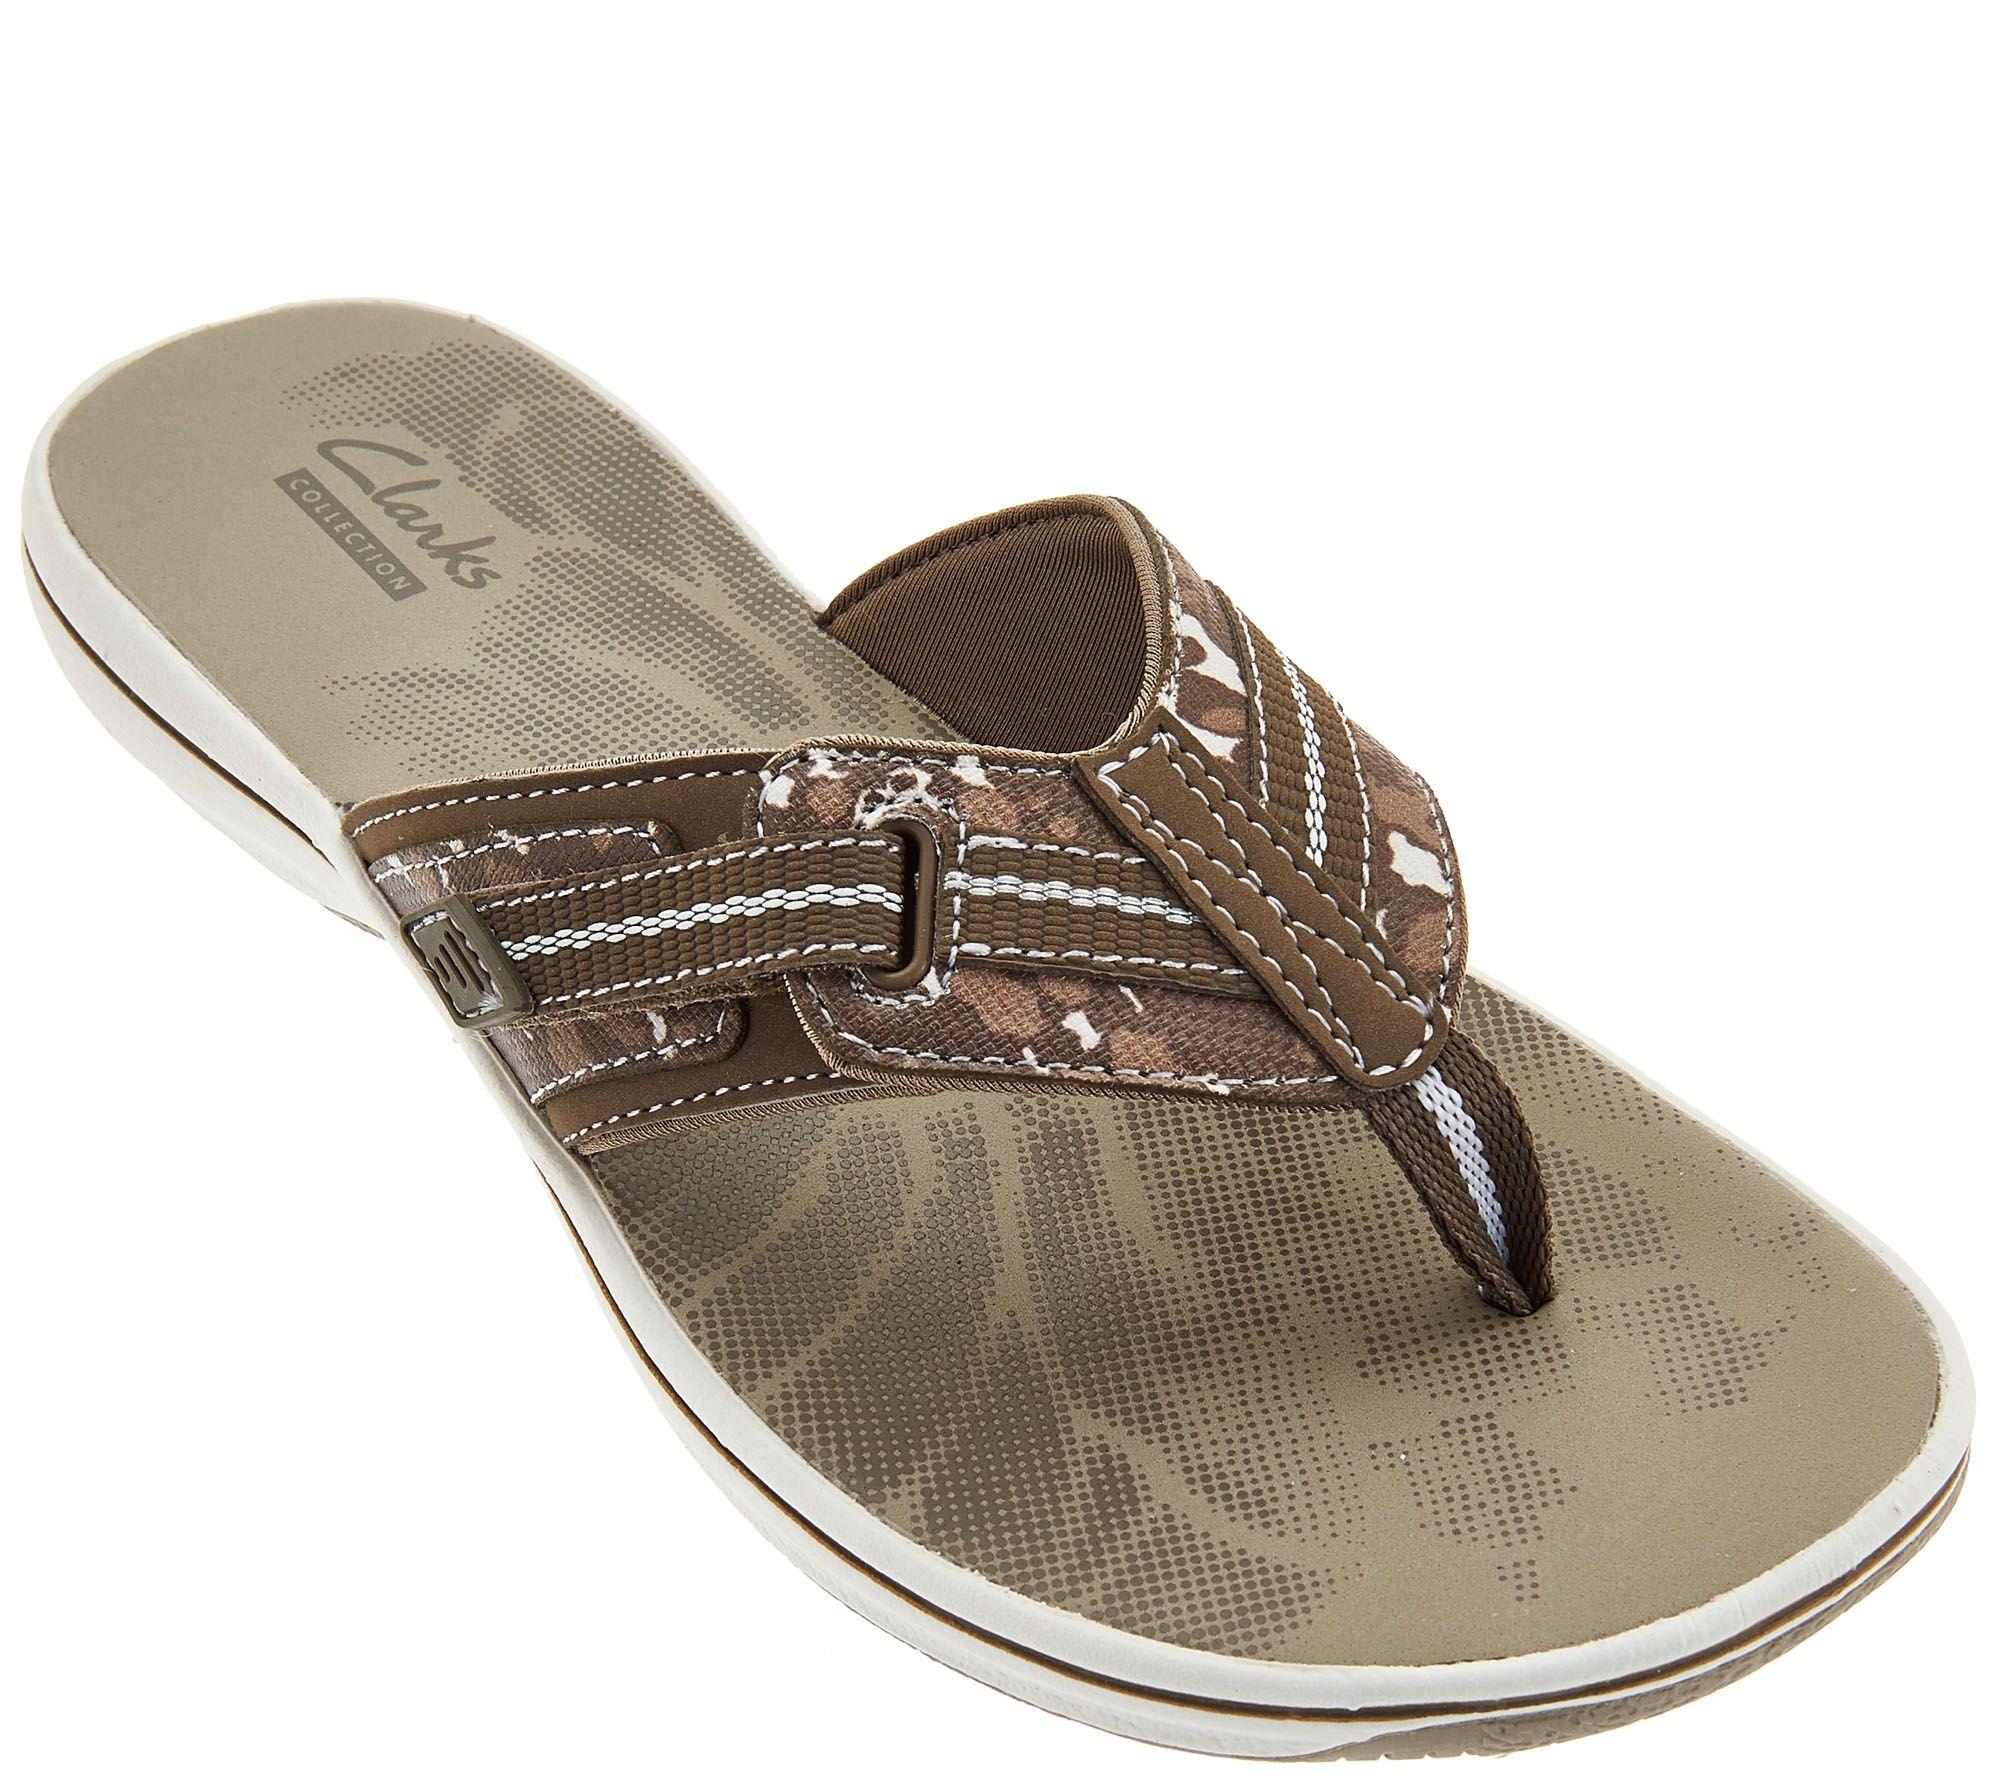 f6692908cb9 Clarks Sport Thong Sandals with Adj. Strap - Brinkley Jazz - Page 1 —  QVC.com